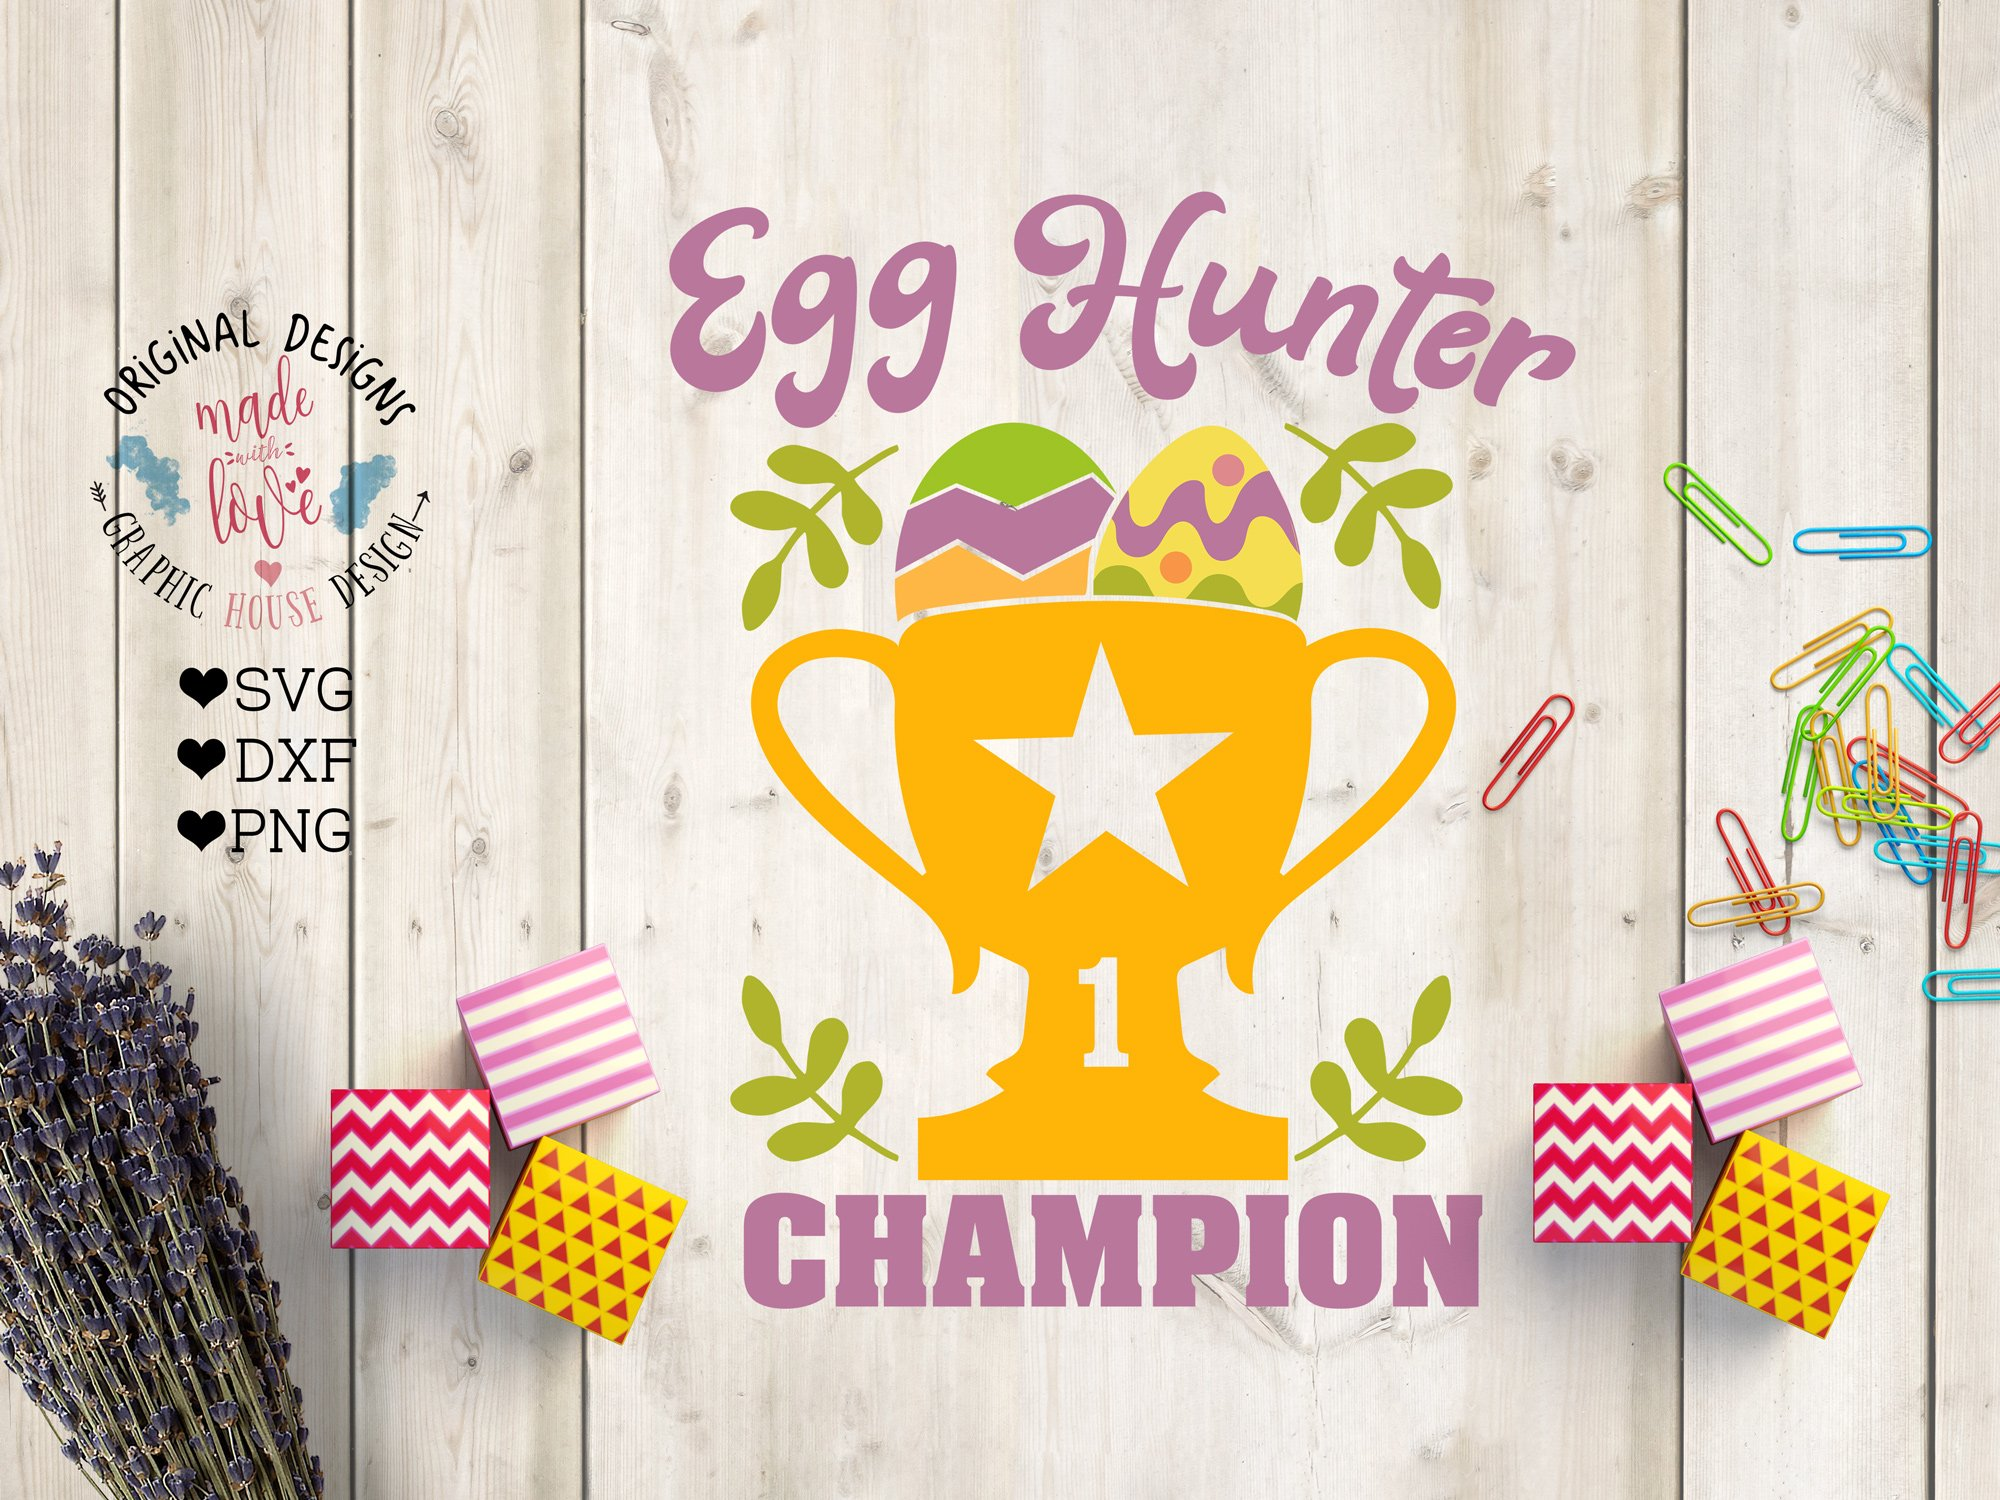 Egg Hunter Champion Cut File Pre Designed Photoshop Graphics Creative Market